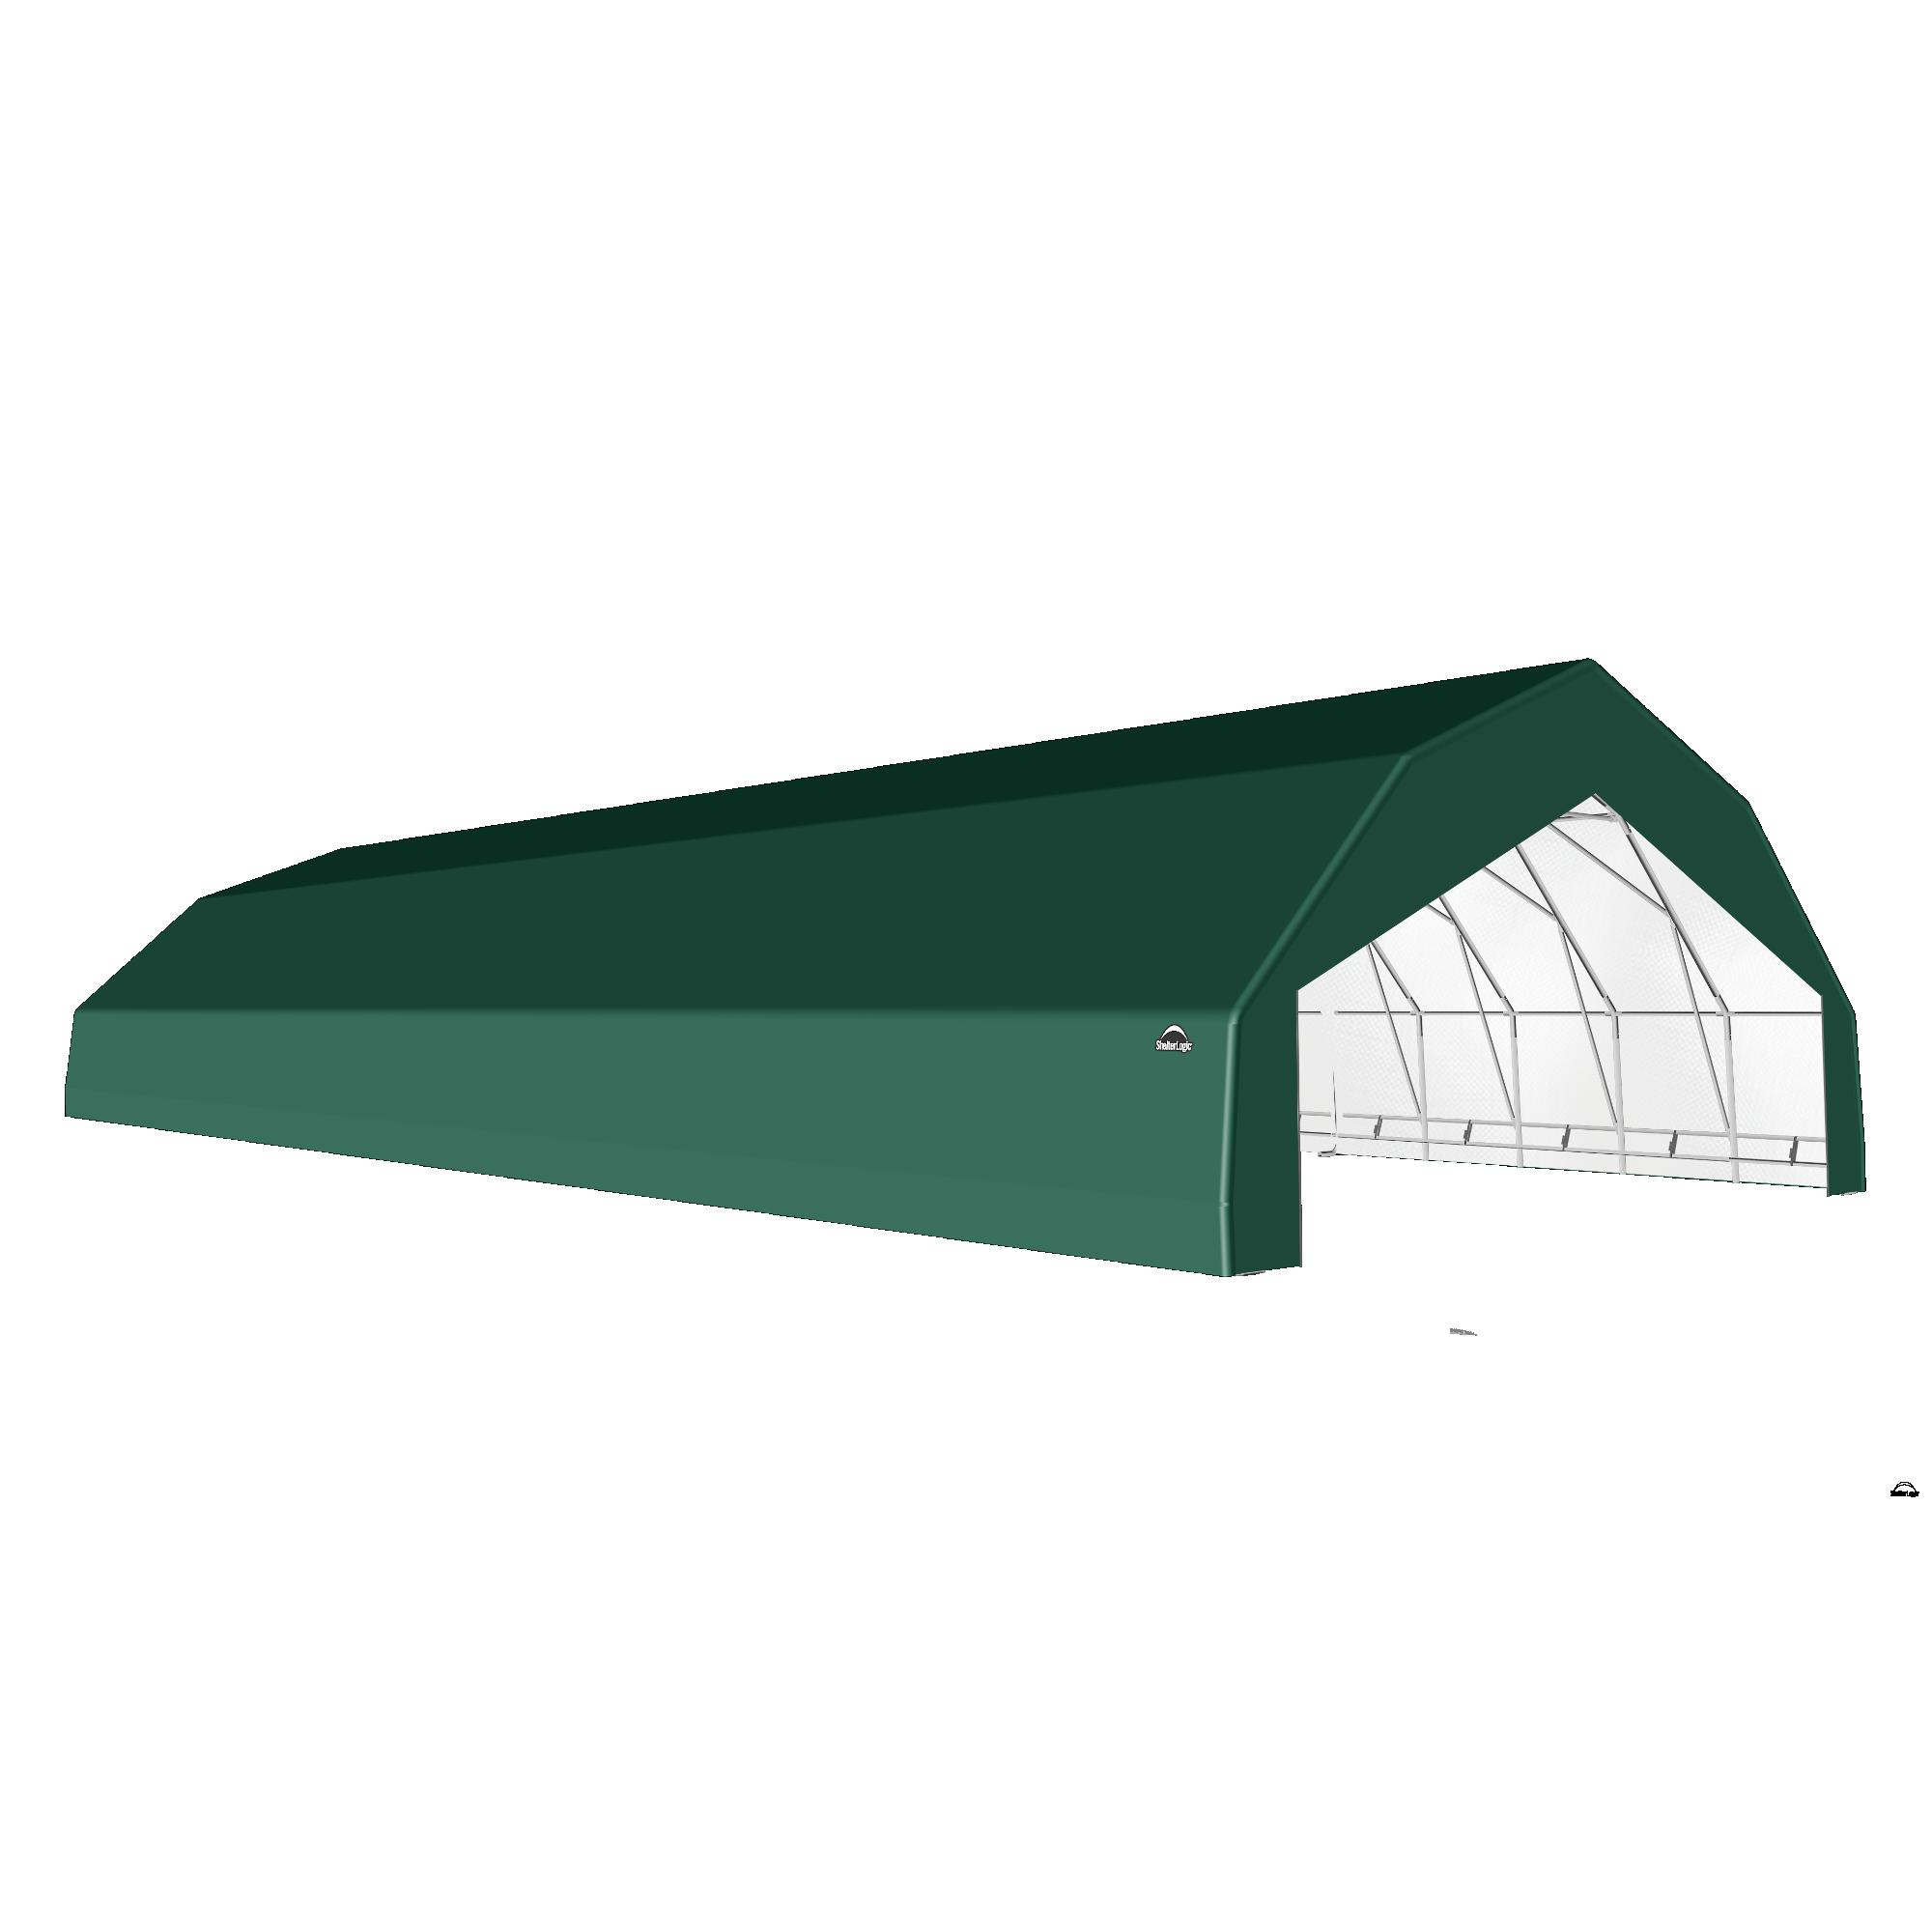 SP Barn 30X72X15 Green 14 oz PE Shelter